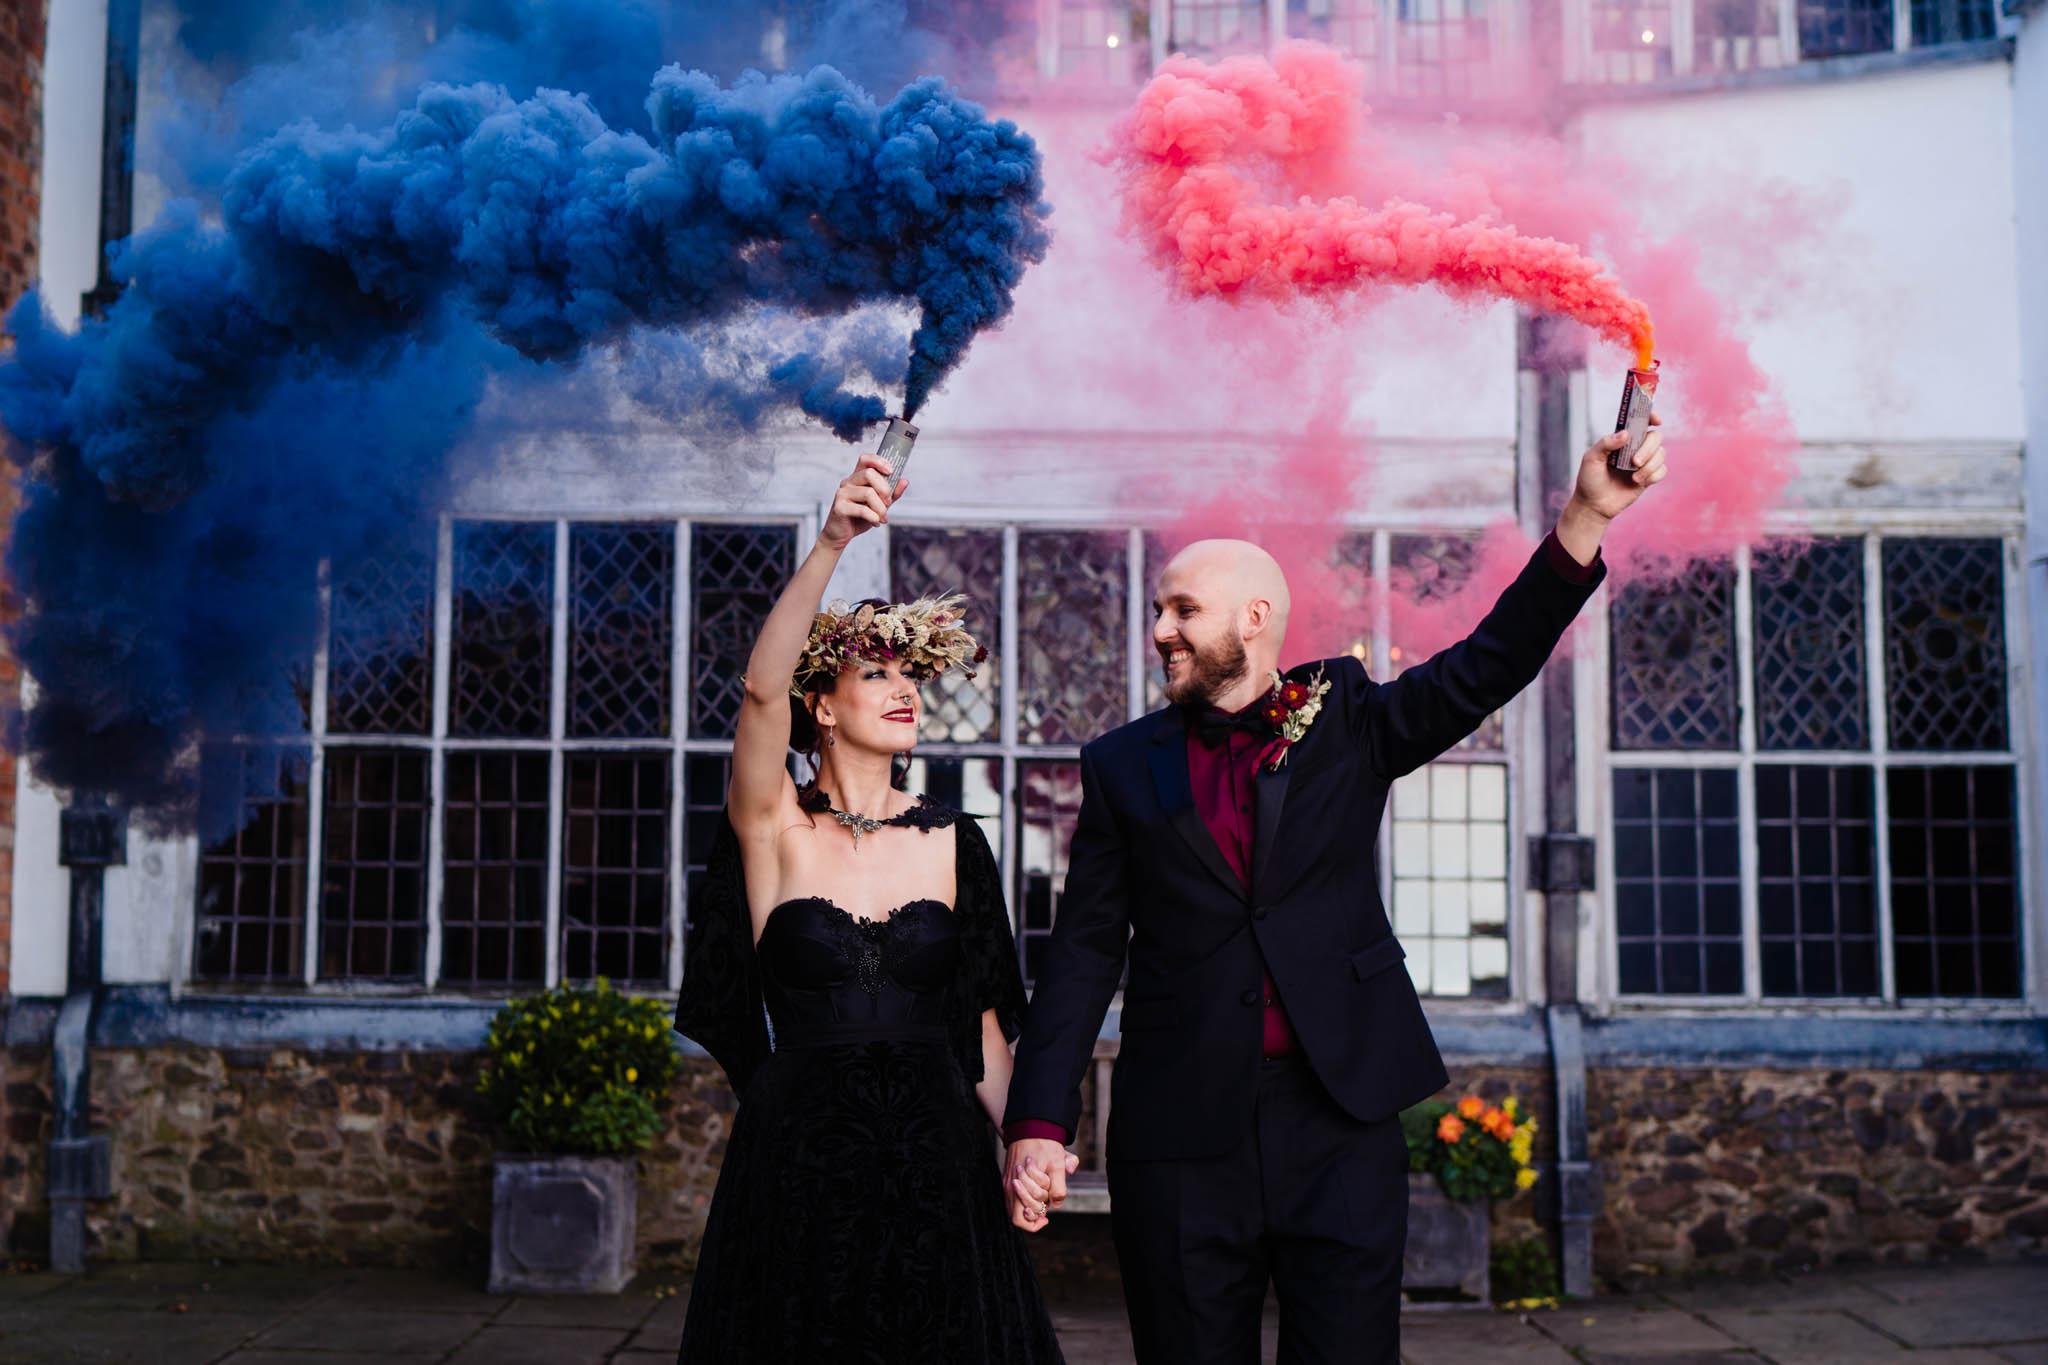 smoke bomb wedding photo -elegant gothic wedding - gothic wedding - autumn wedding